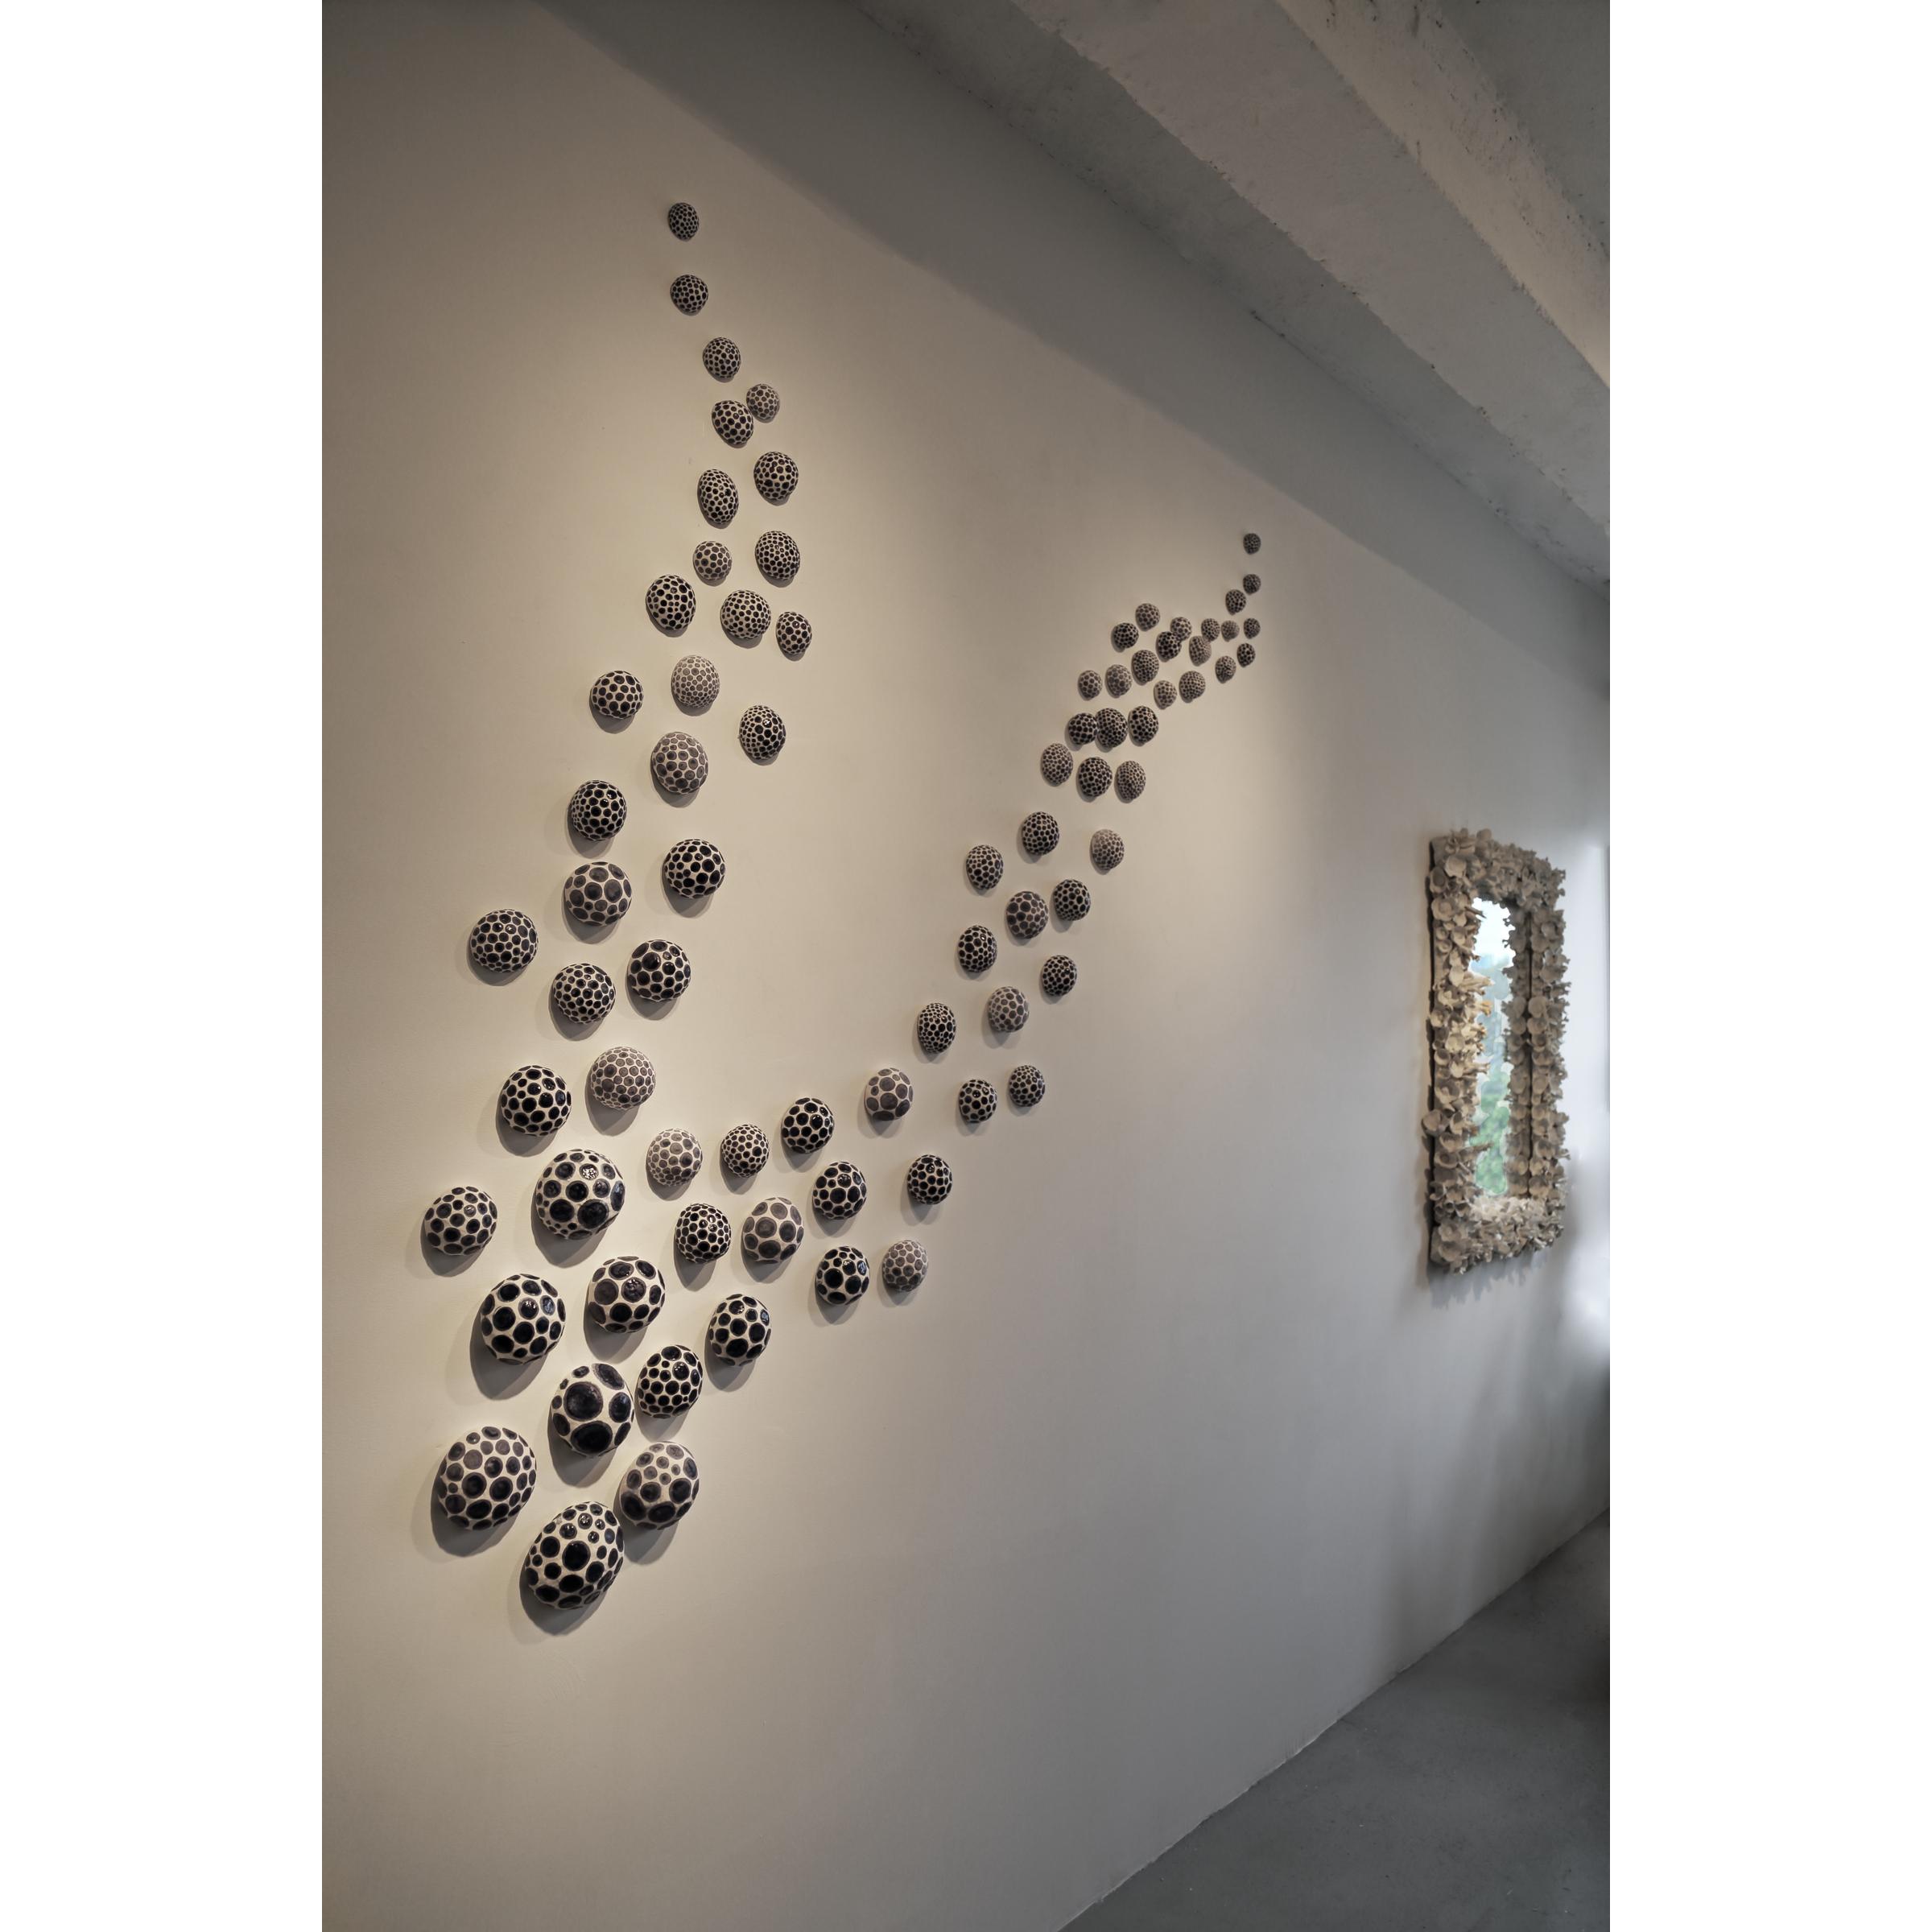 Polka Dot Bubbles